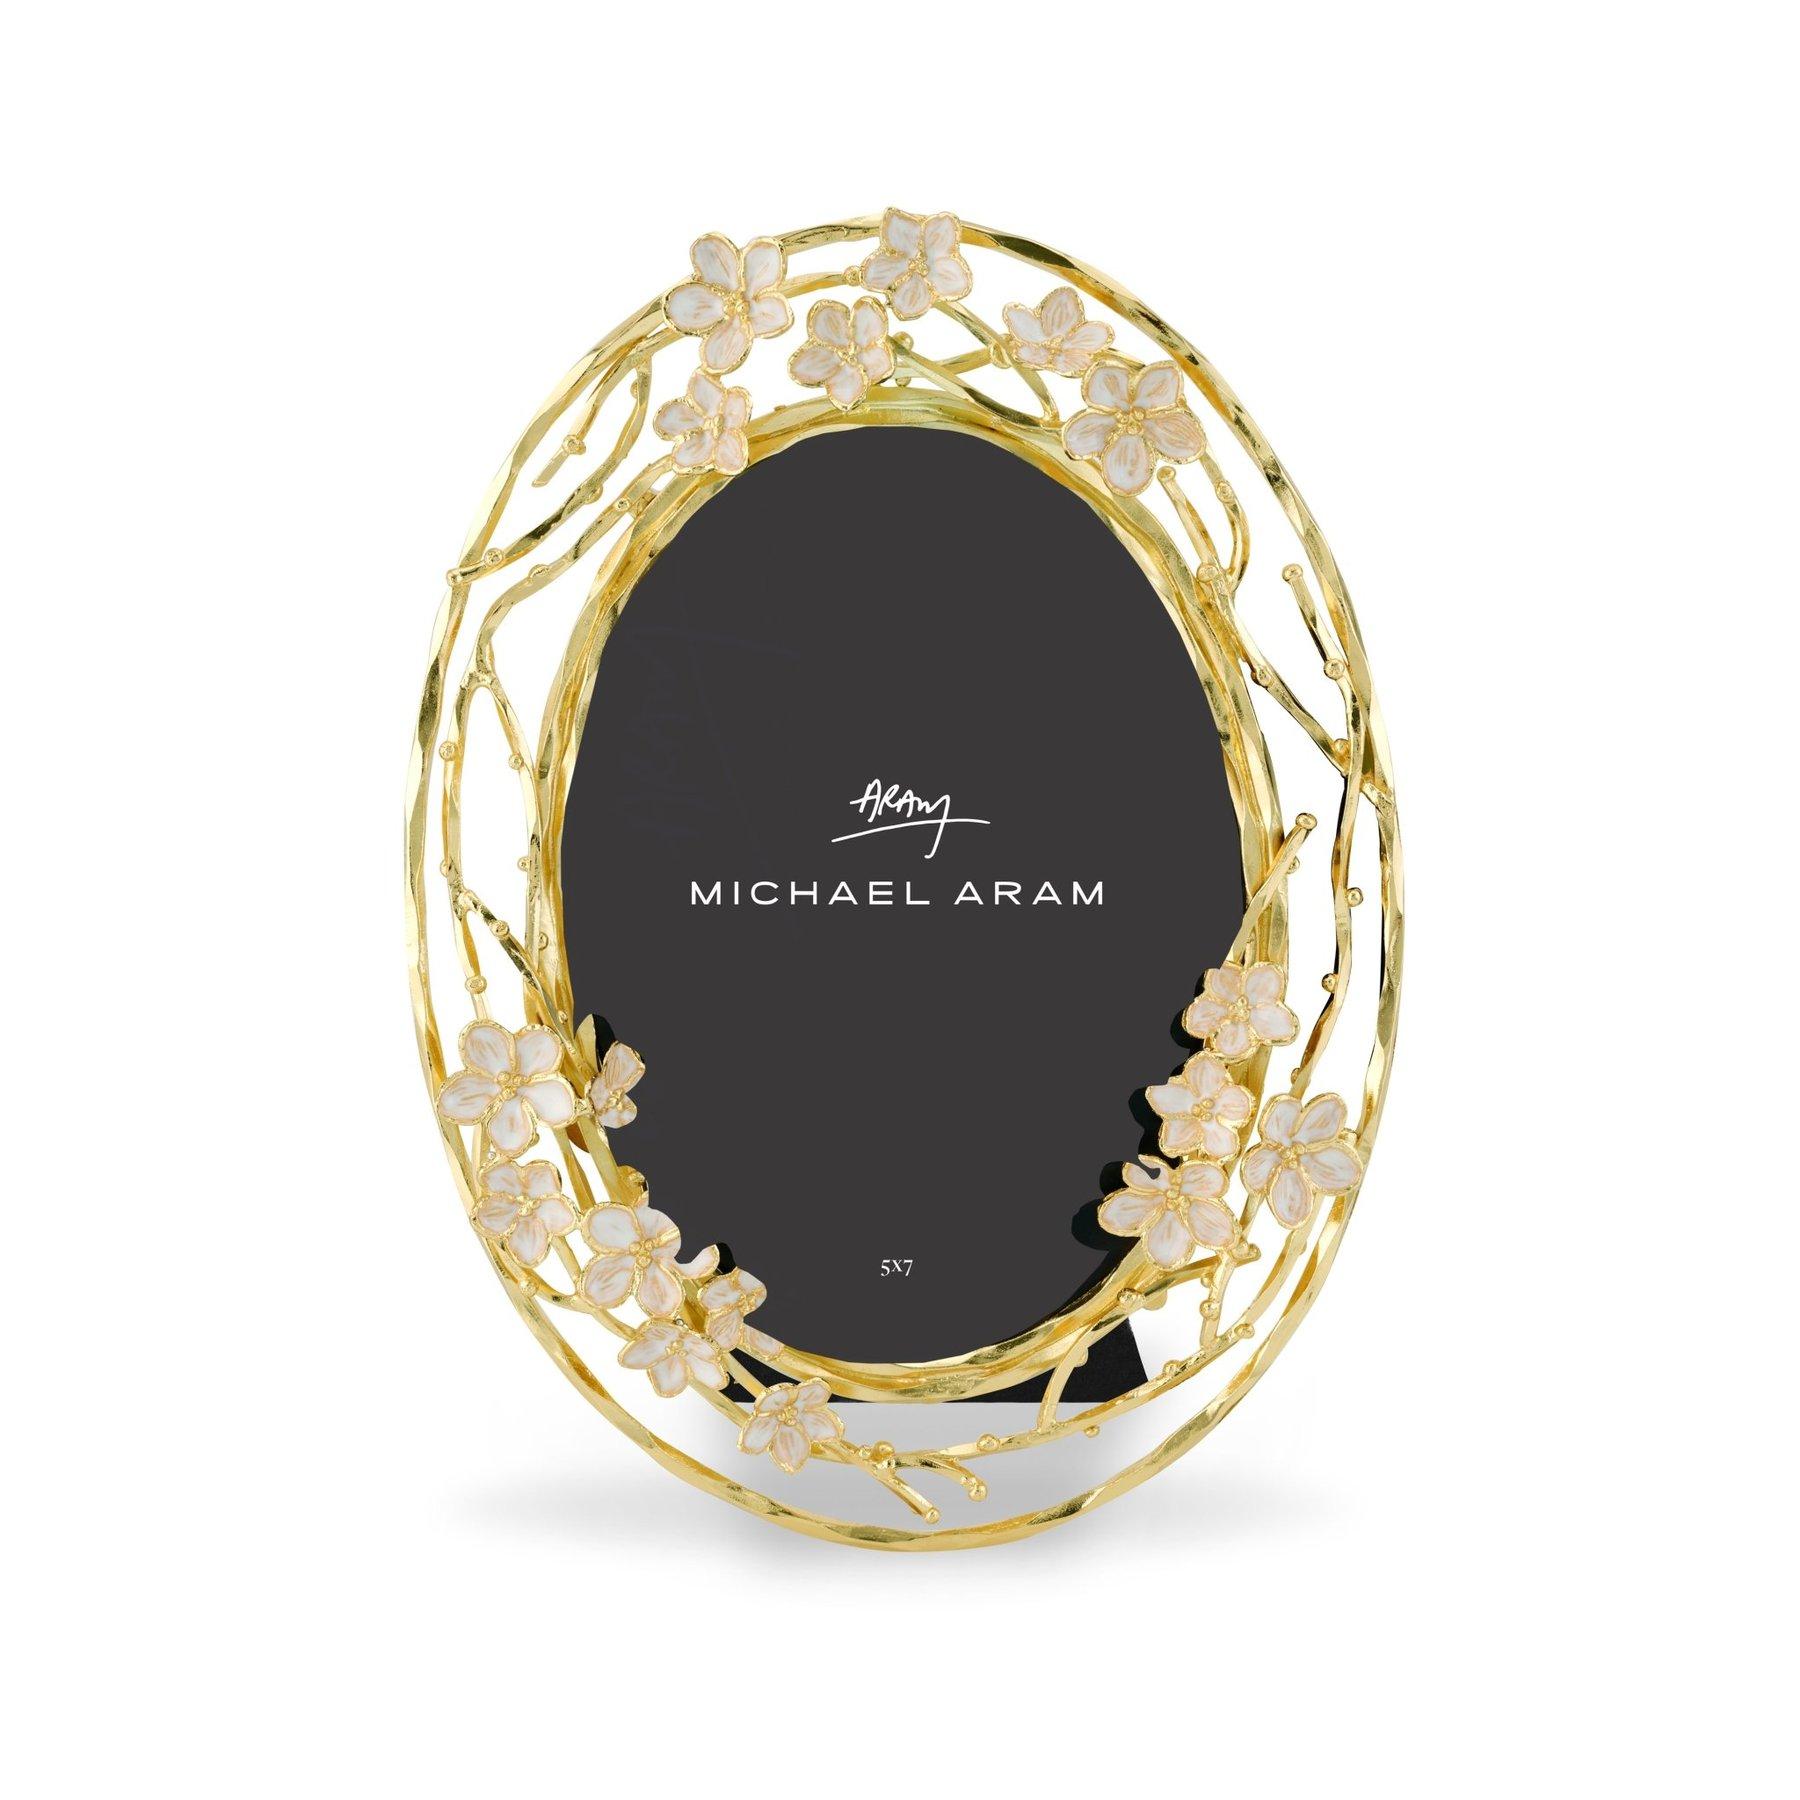 michael-aram-cherry-blossom-oval-frame-5x7-616897_1800x1800